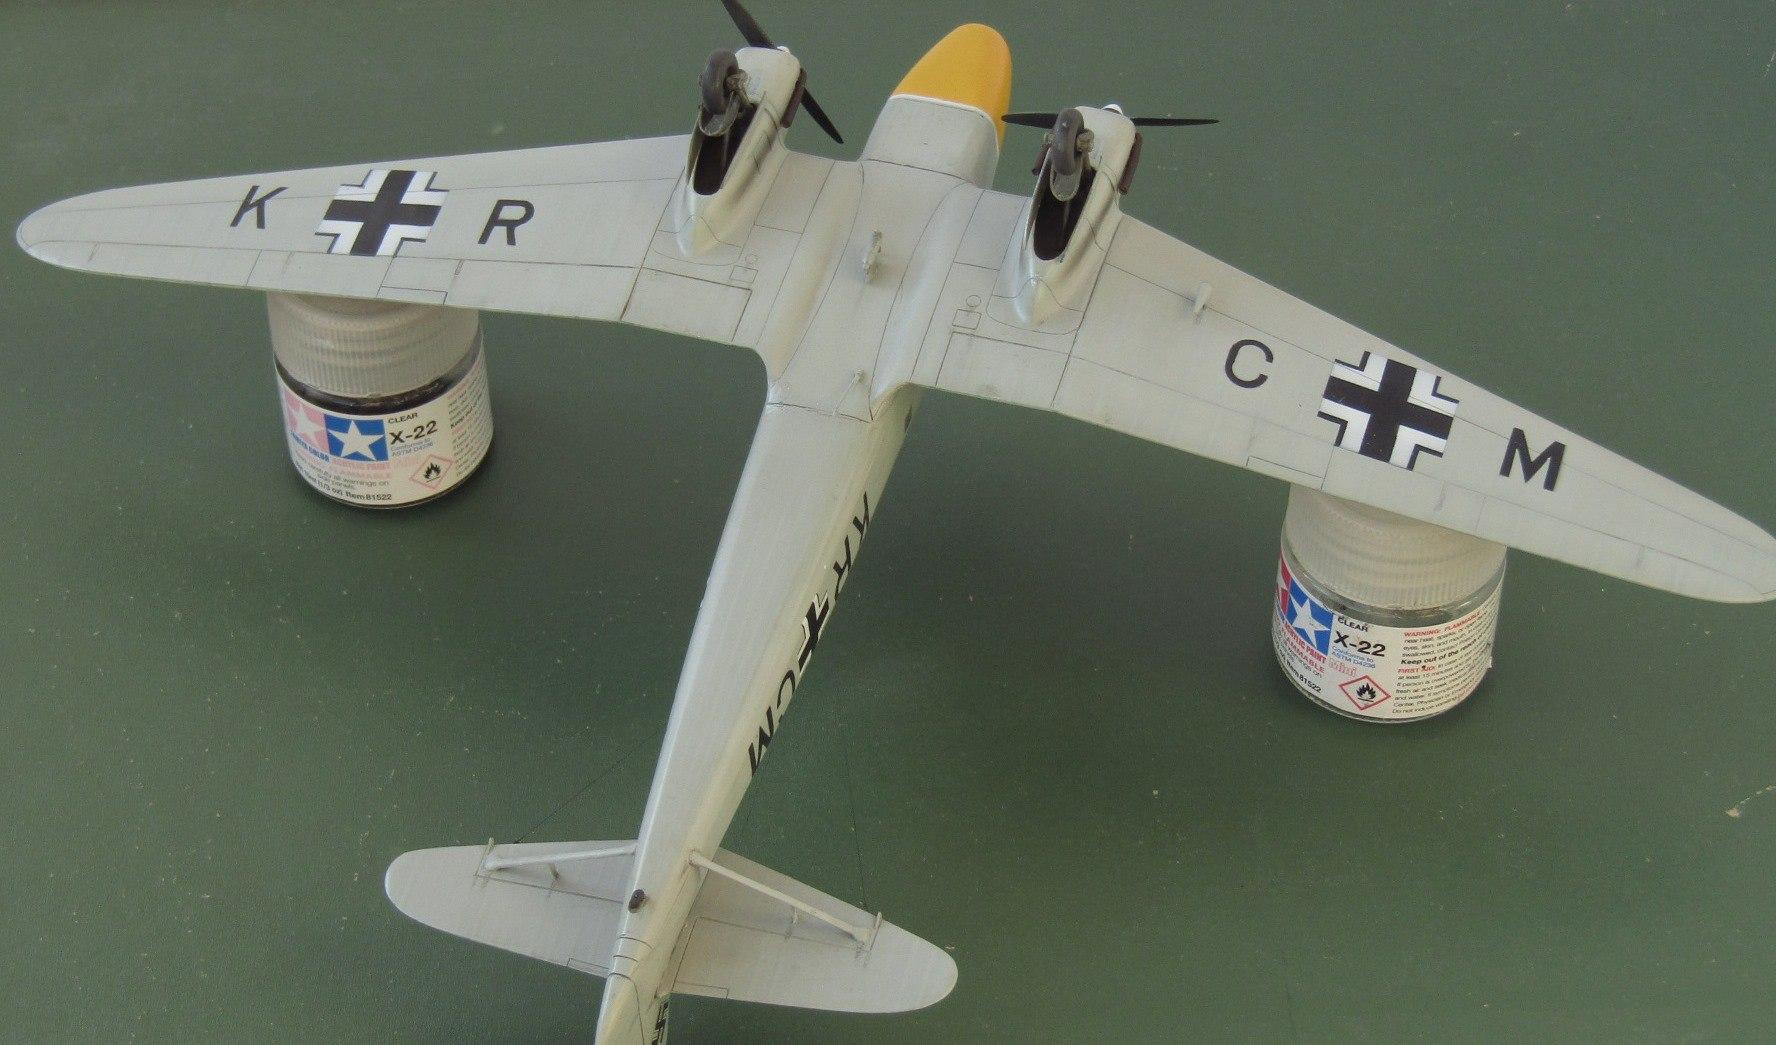 FW - 58C weihe 1/72 (Special Hobby) 0mKjmqwiBsk